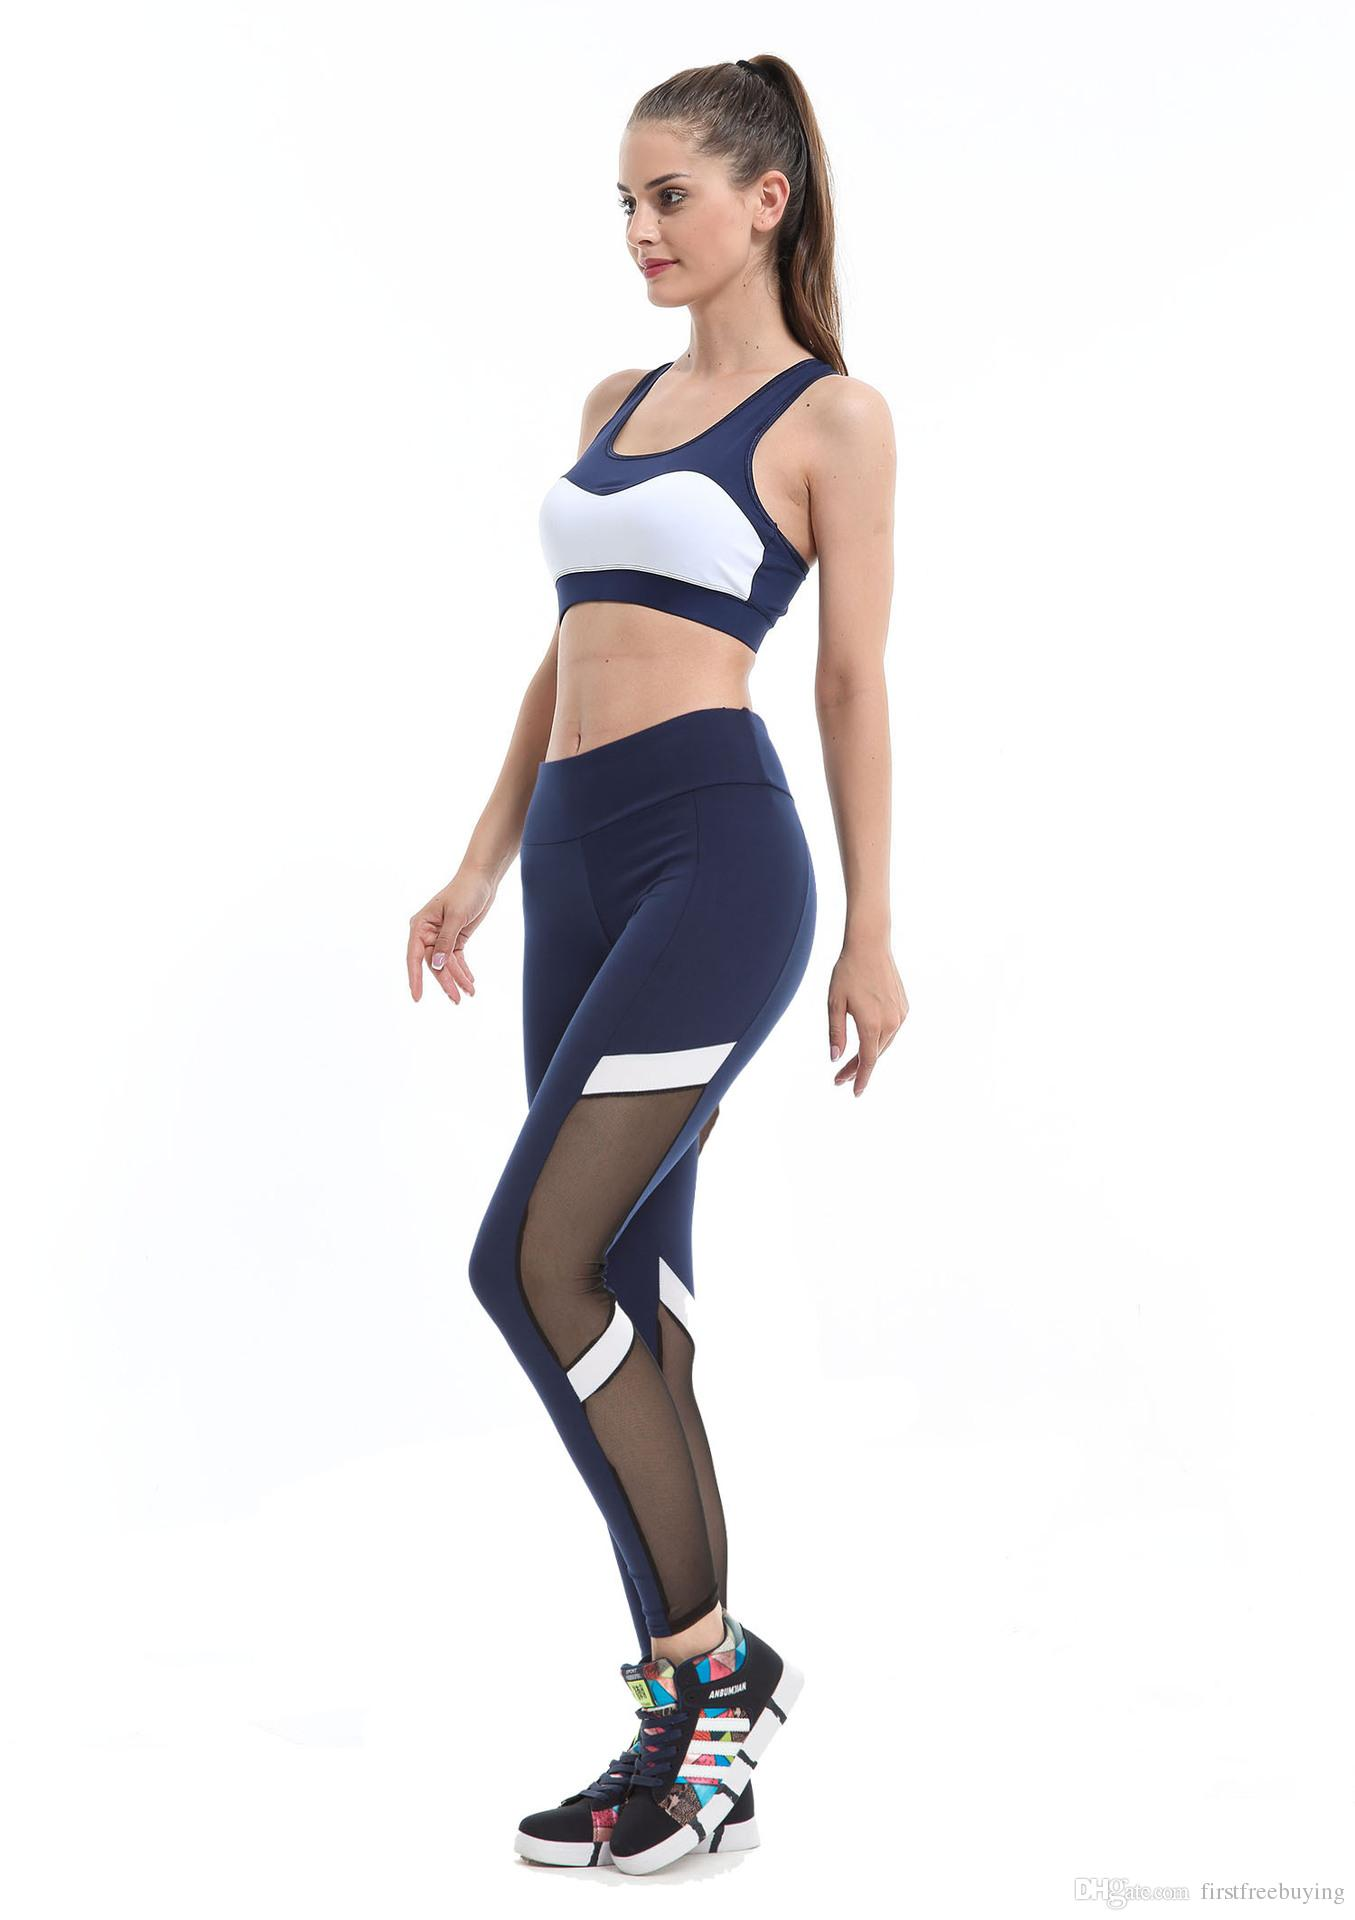 1 Pc/Lot Fashion Four Seasons Sports Yoga Pants Women's Legs Hollow Stretch Fitness Sports Trousers Pants ladies leggings